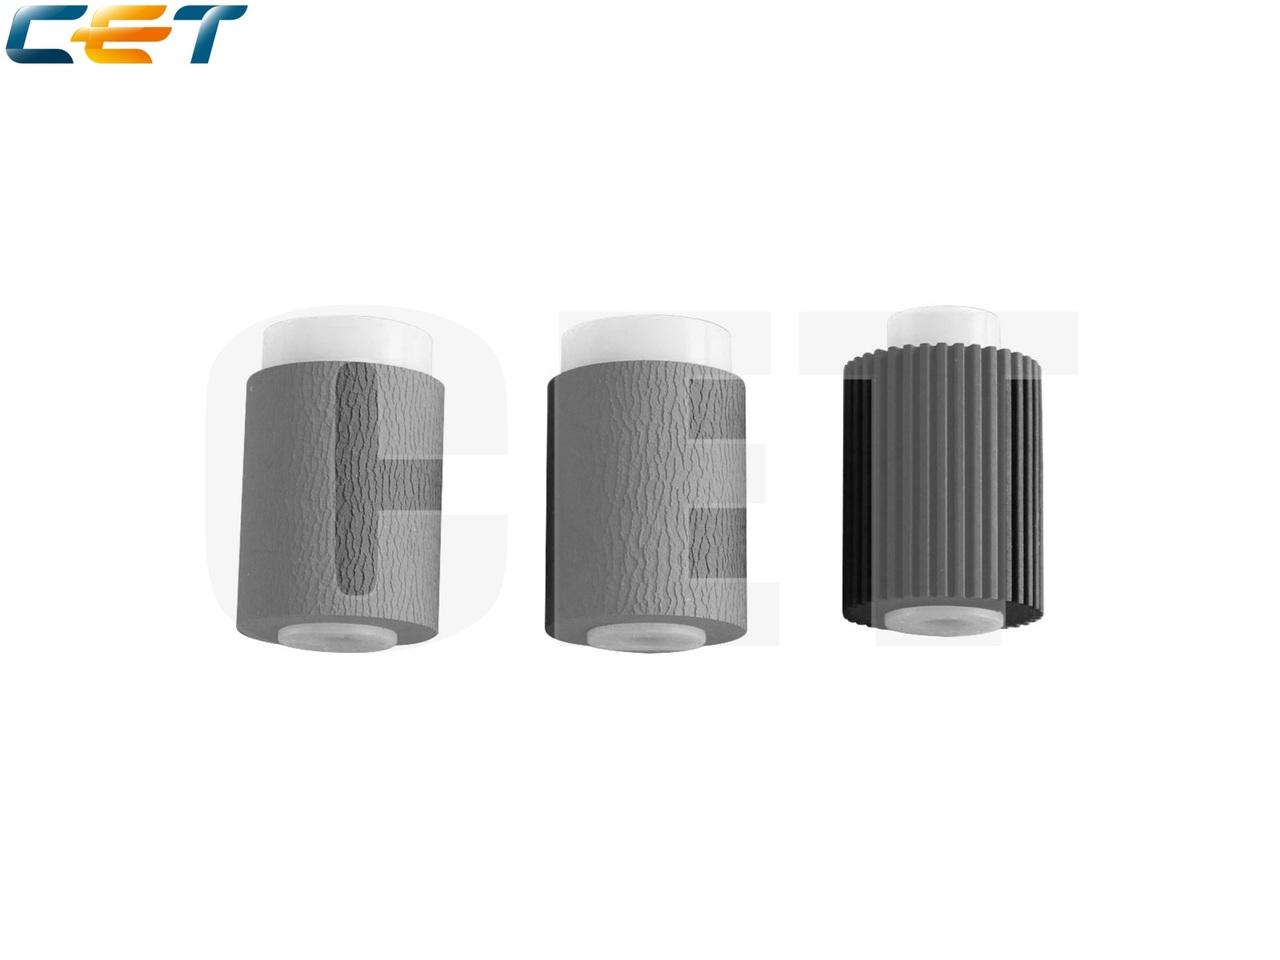 Комплект роликов подхвата ADF NROLR1542FCZZ (1 шт.),NROLR1541FCZZ (2 шт.) для SHARPAR-2048S/2048D/2048N/2348D/2348N/2648N/3148N (CET),CET6590